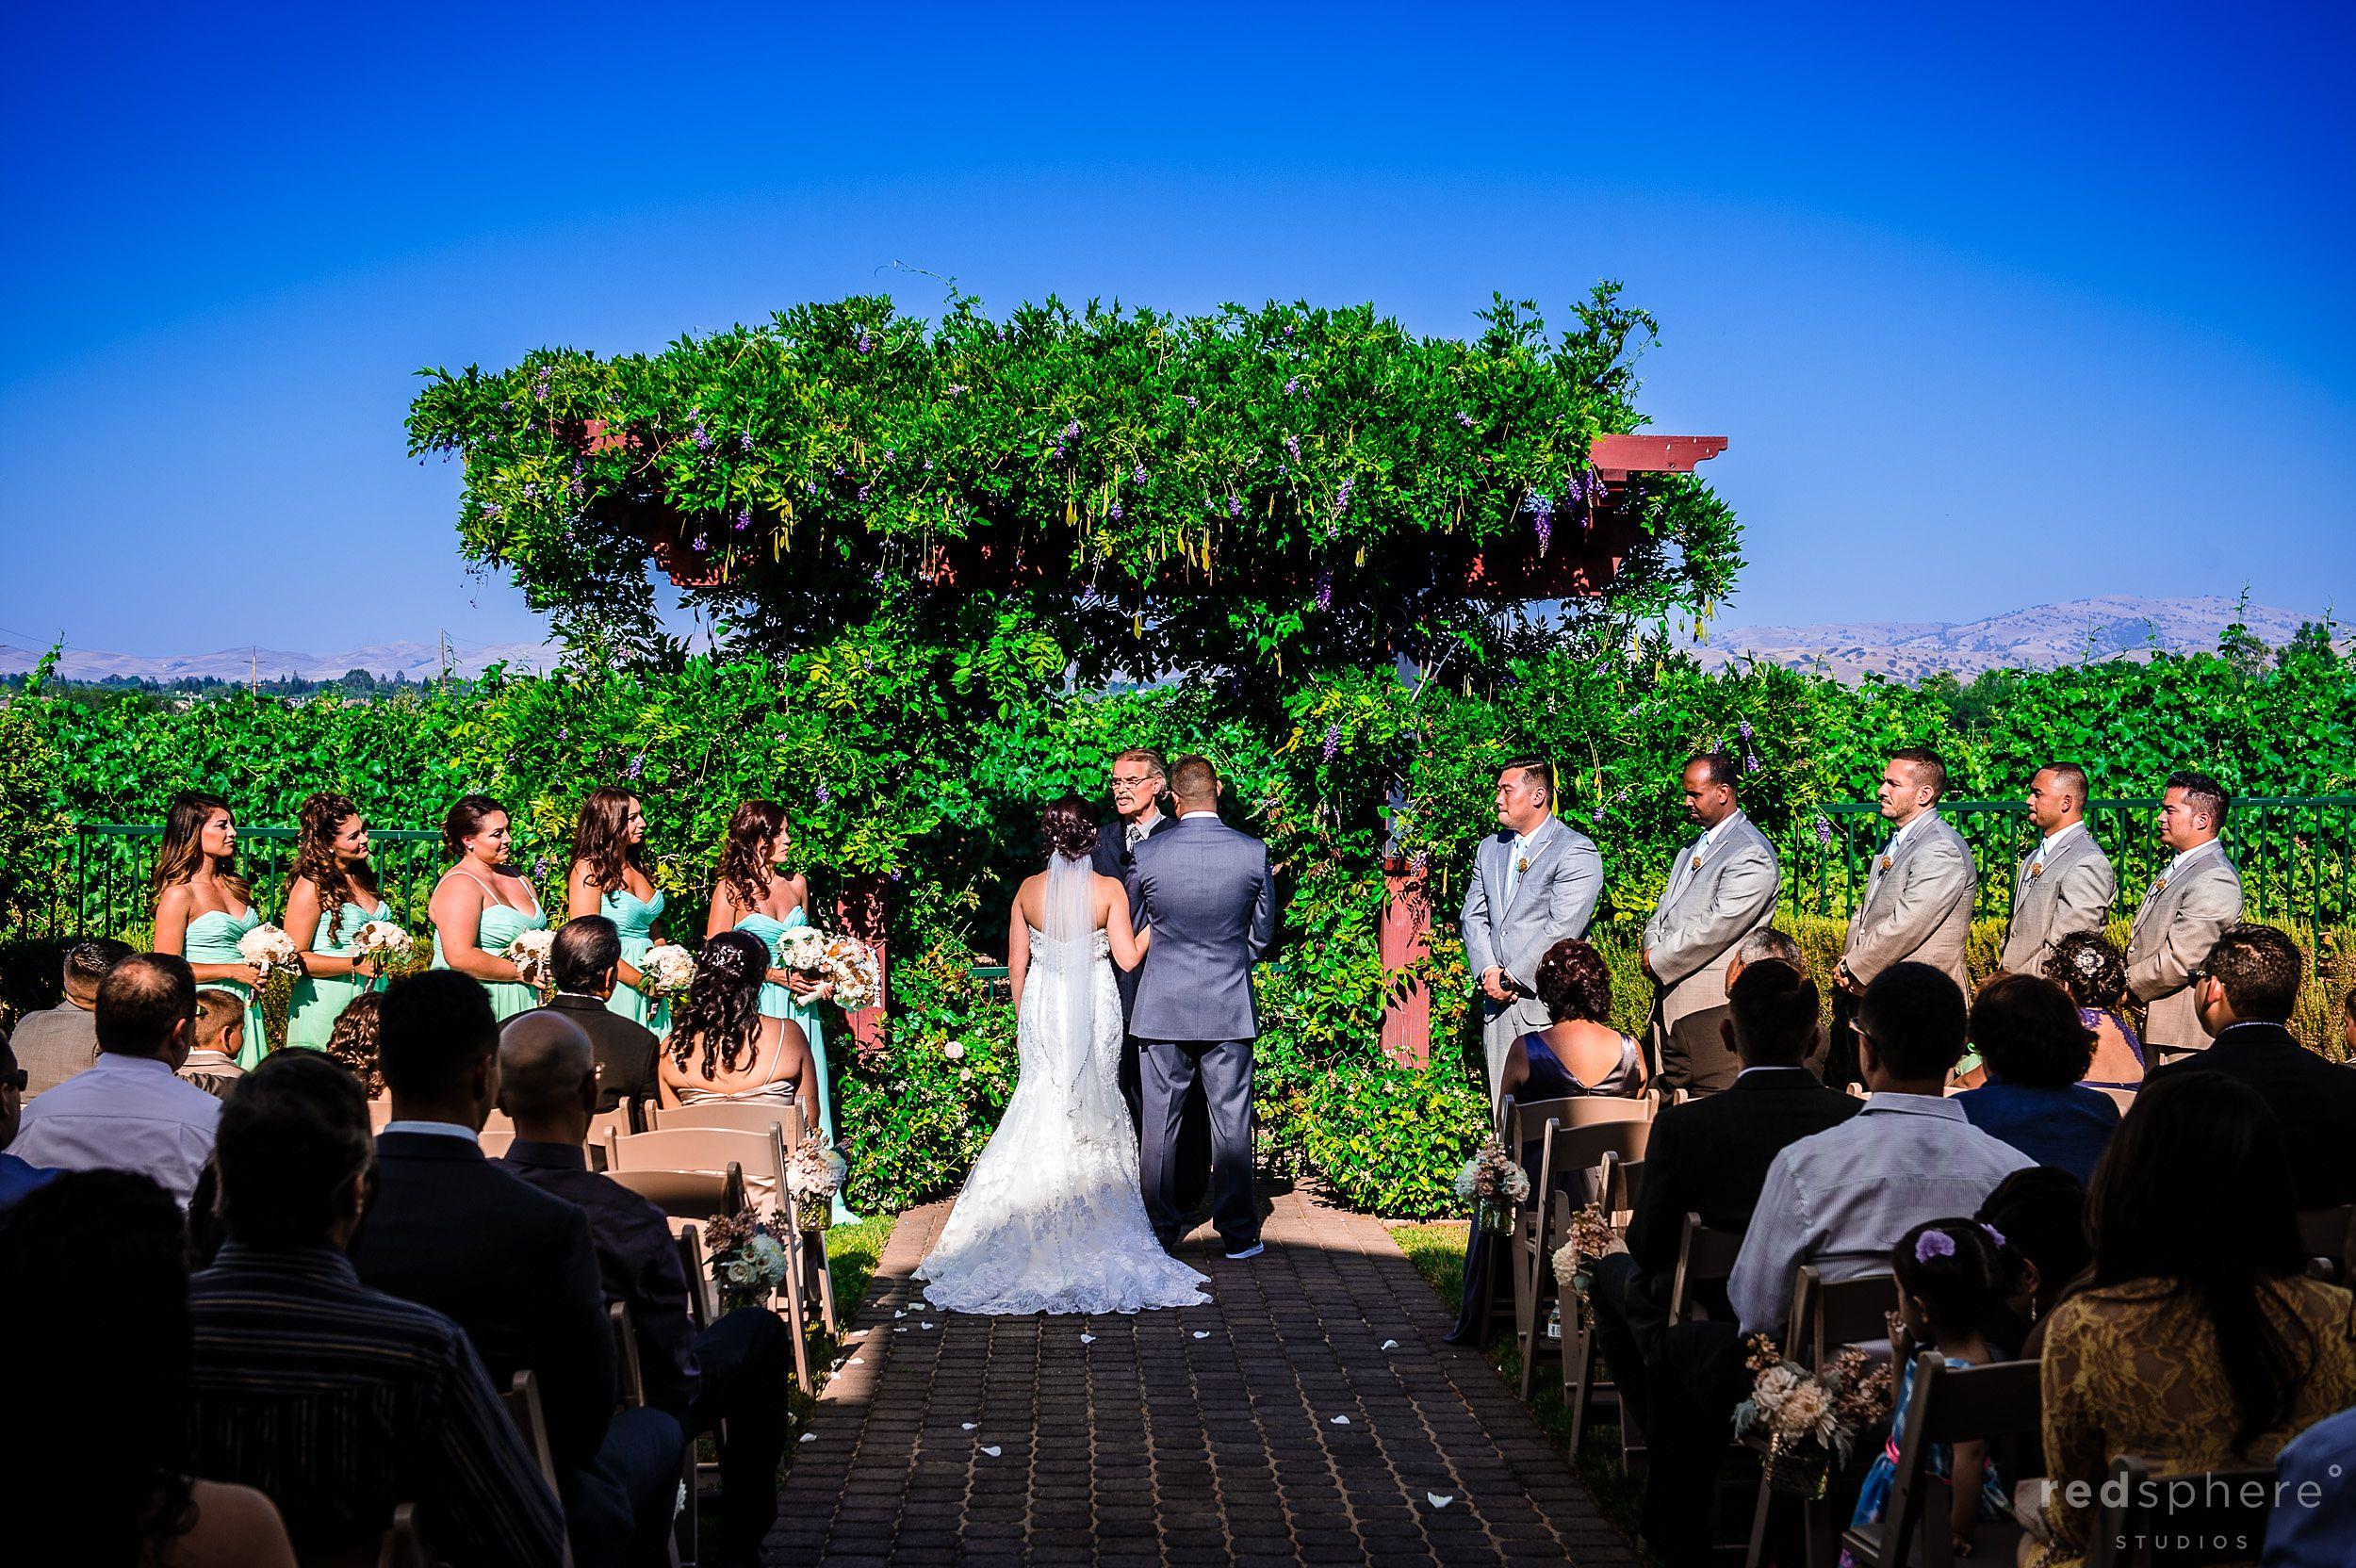 Bride and Groom Face Officiant at Pleasanton, California Wedding